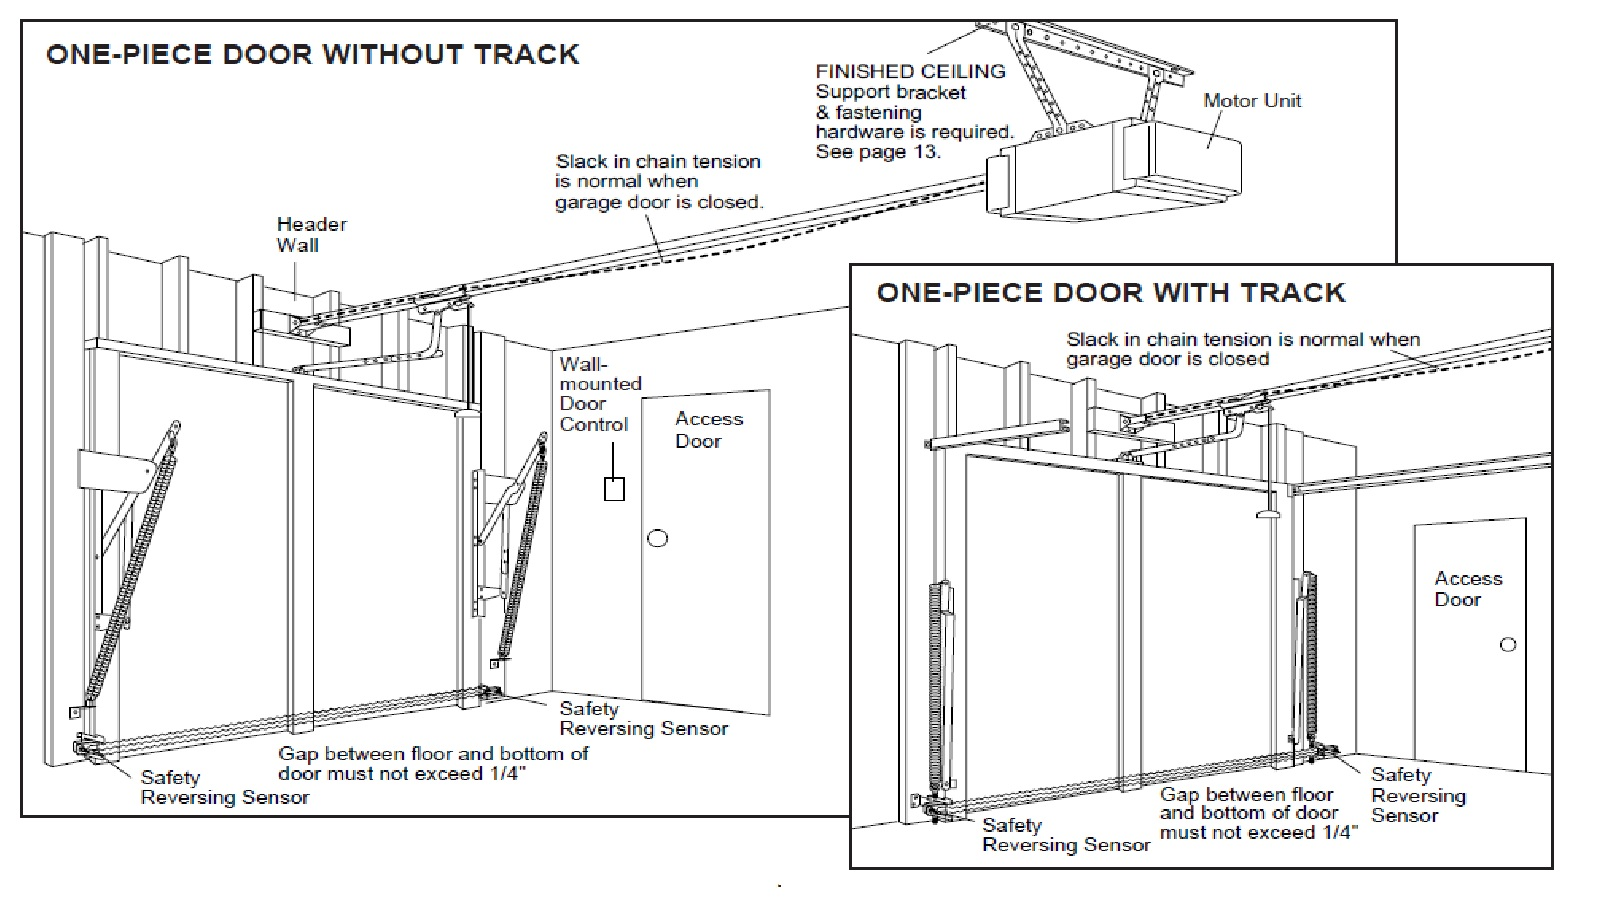 [TVPR_3874]  Introduction to residential garage doors | Industrial Garage Door Openers Wiring Diagram |  | LiftMaster, Chamberlain & myQ Support | Chamberlain Group